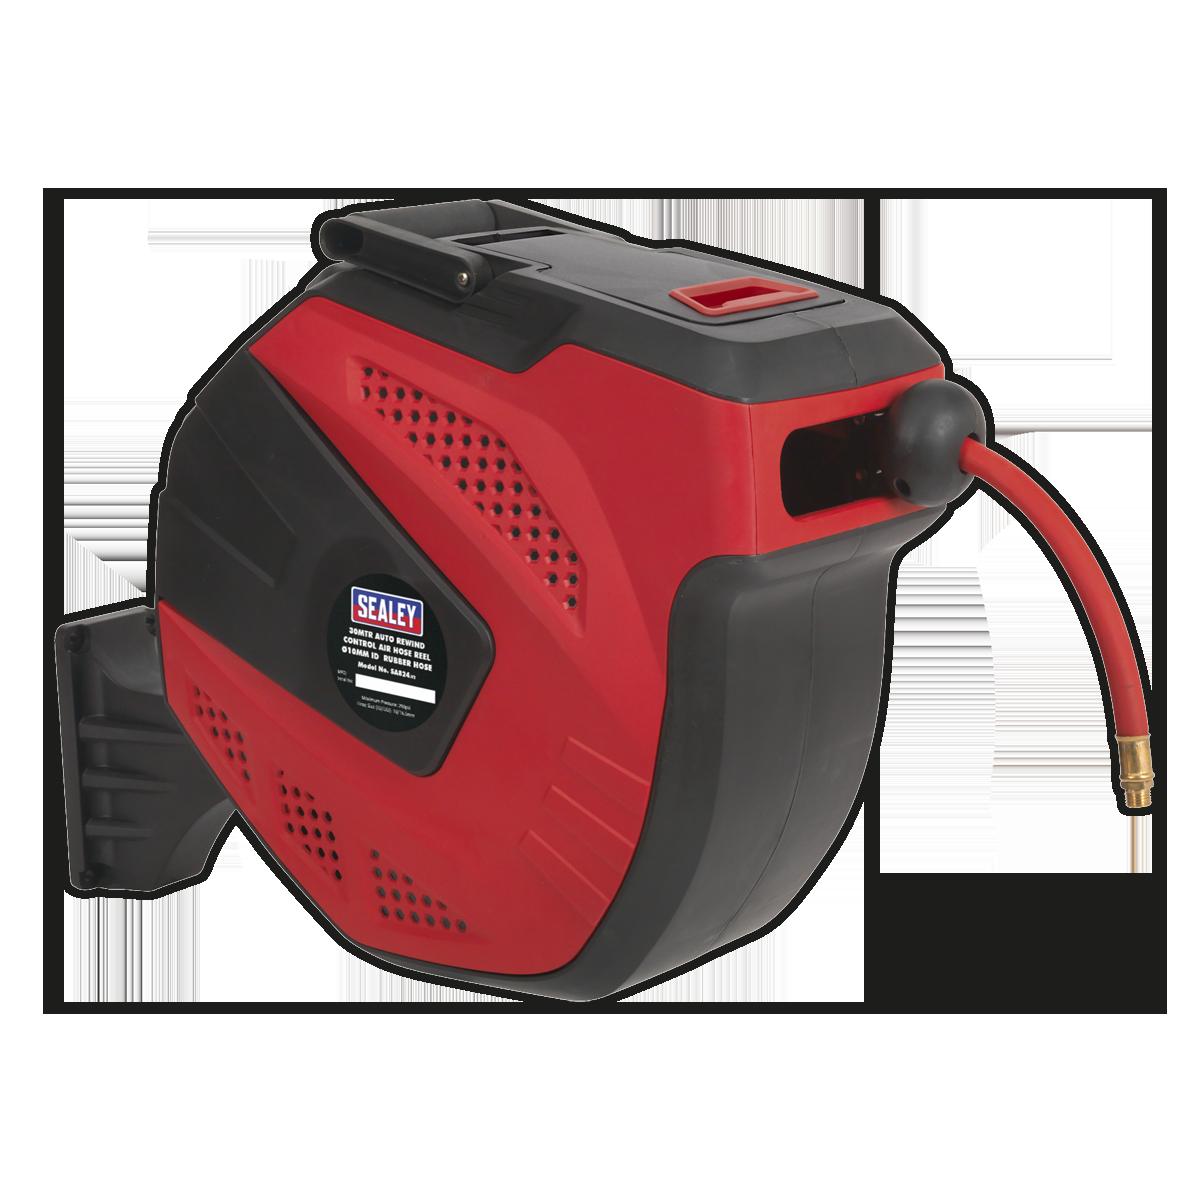 Air Hose Reel Auto-Rewind Control 30m Ø10mm ID - Rubber Hose